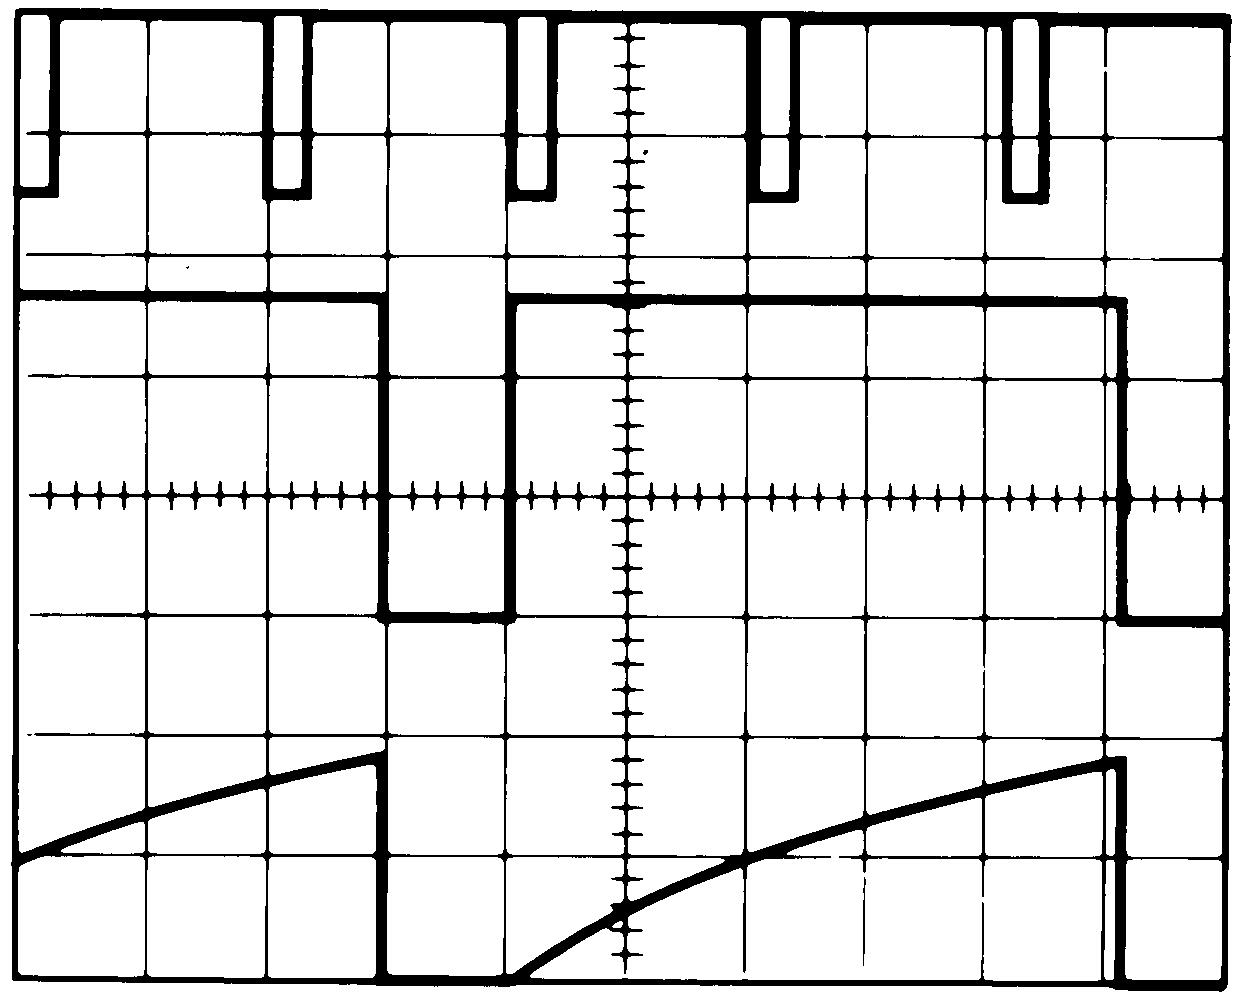 Lmc555 Simple Pulse Position Modulation Circuit 932 Application Curve